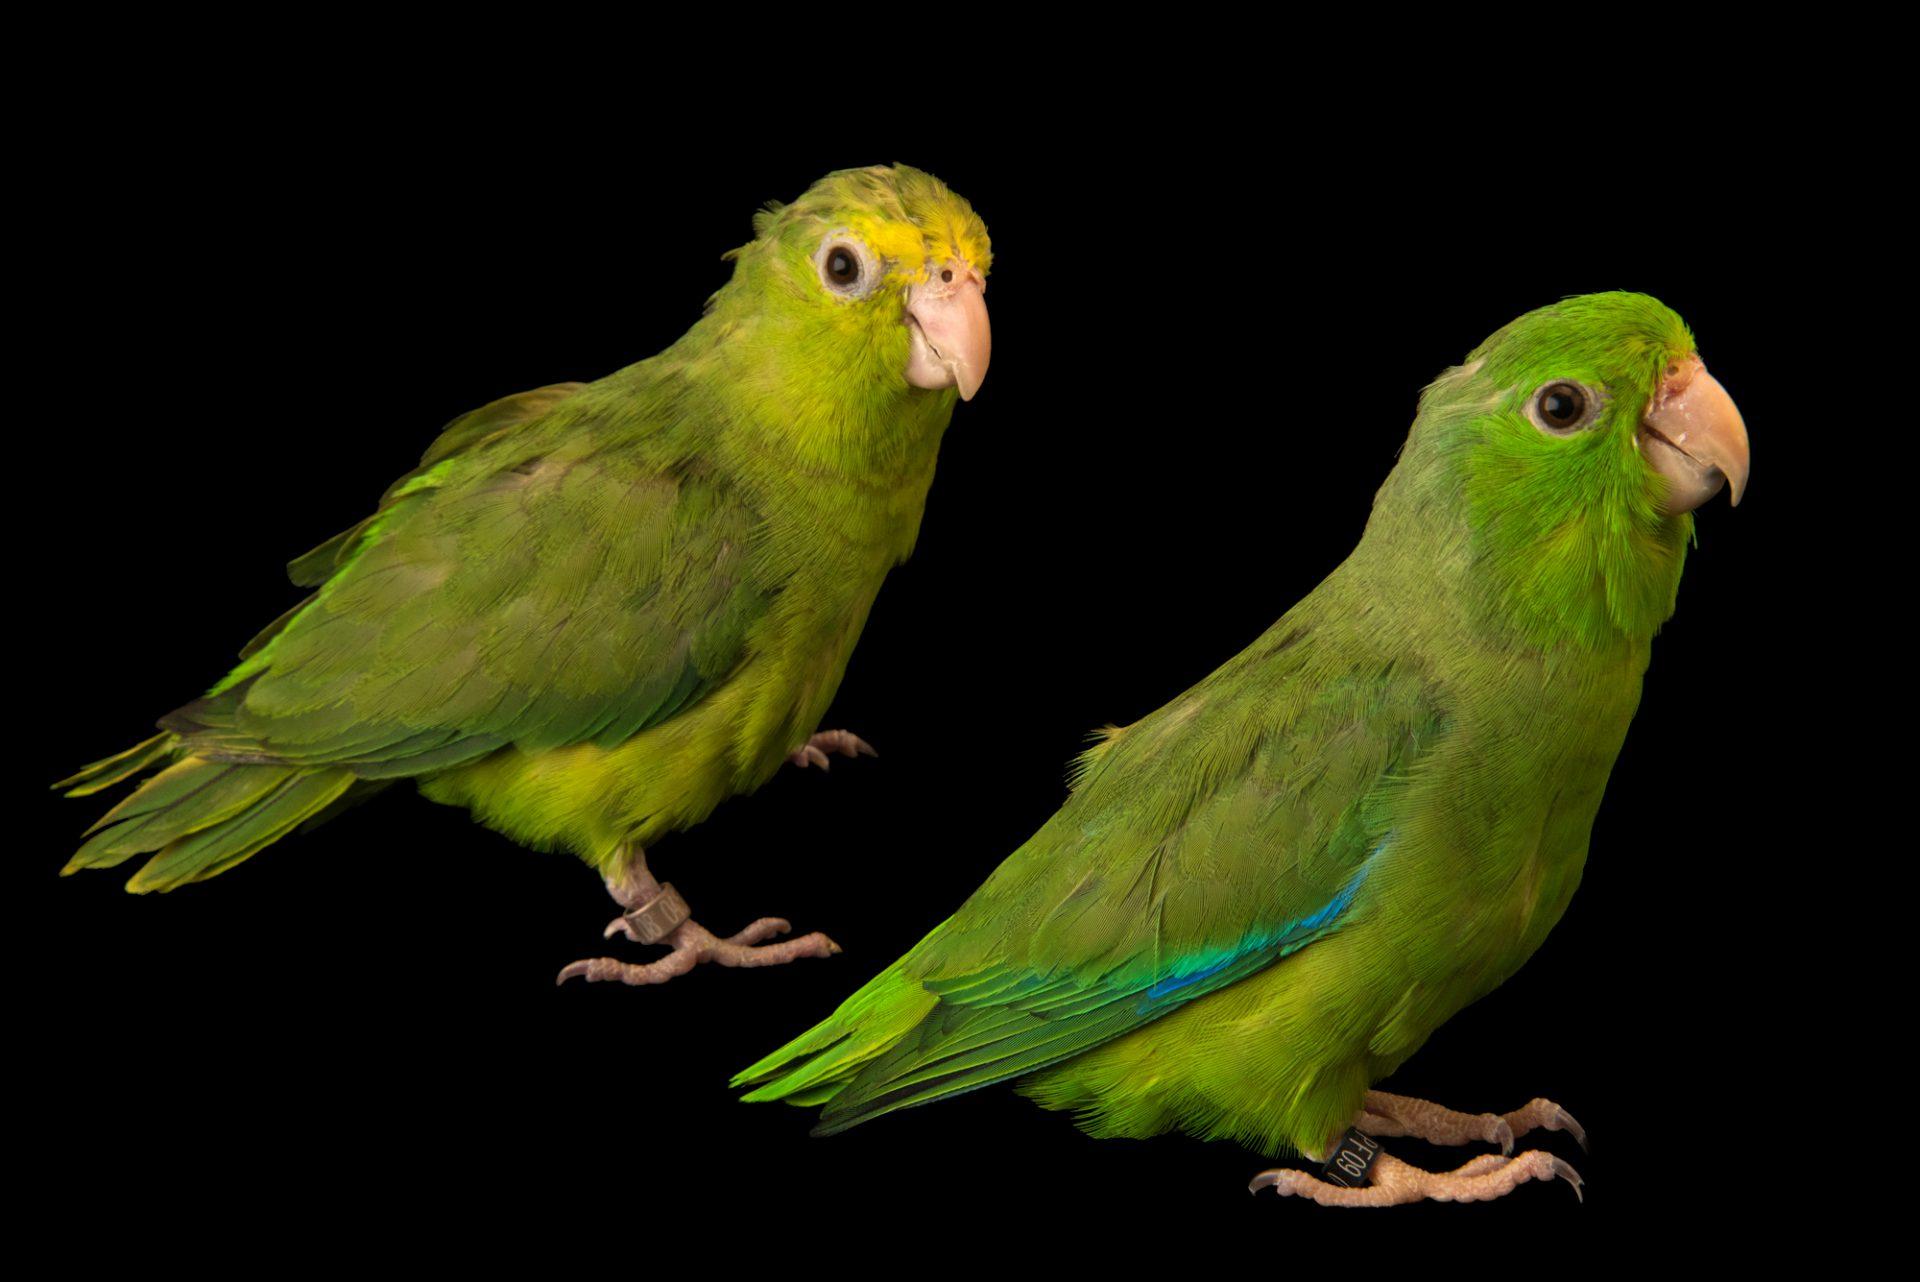 Photo: Male and female green rumped parrotlets (Forpus passerinus deliciosus) at Loro Parque Fundacion.